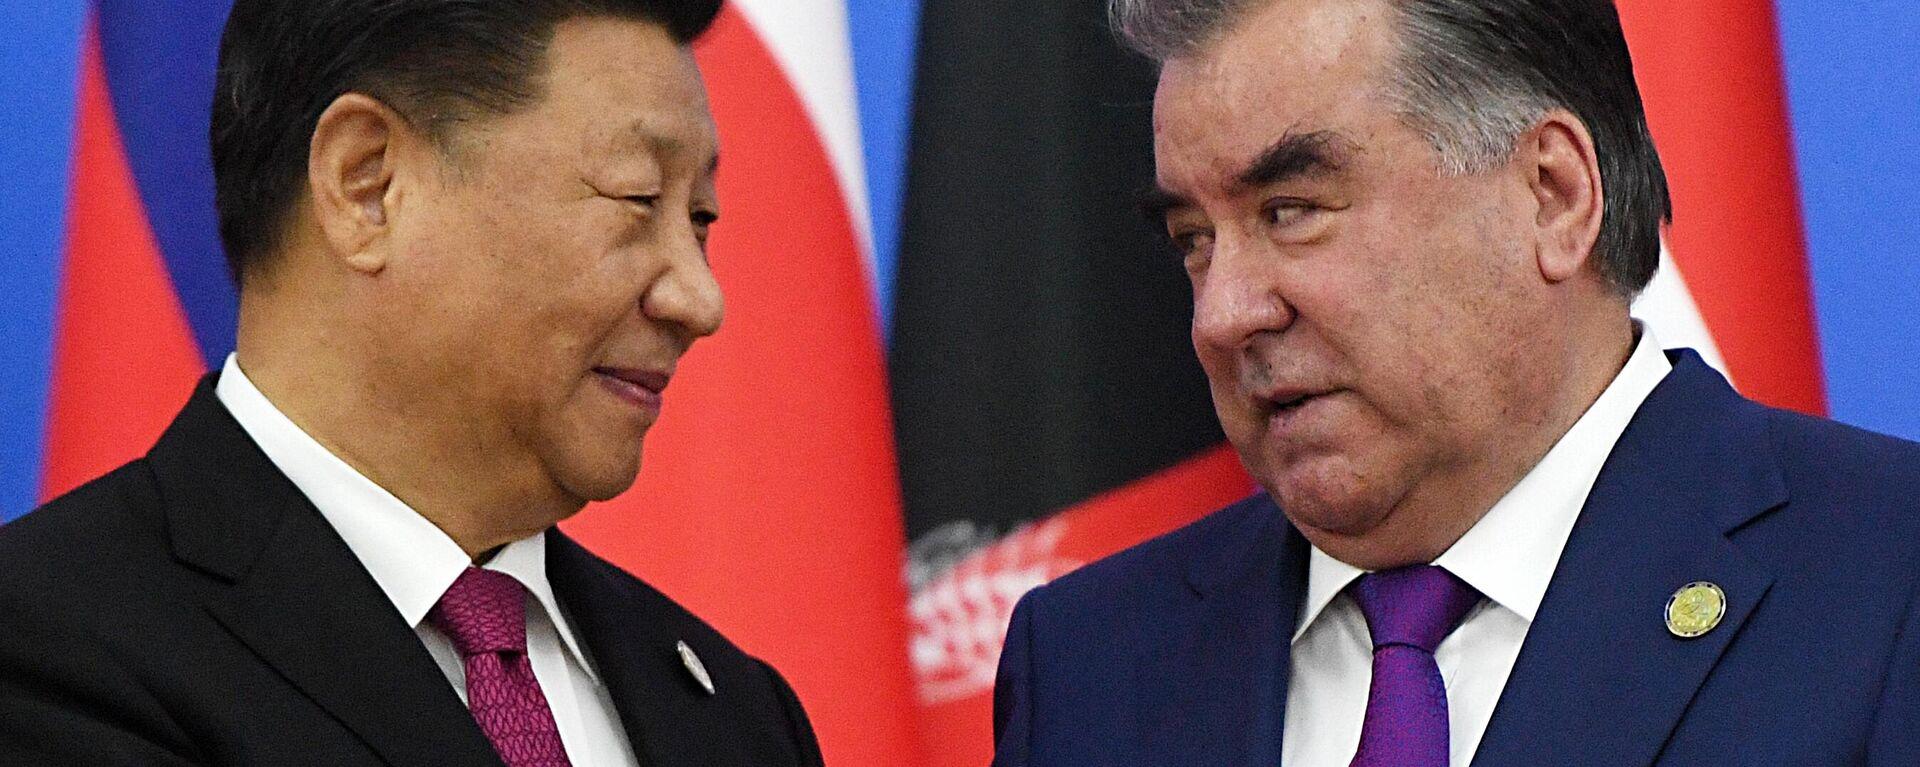 Президент Таджикистана Эмомали Рахмон (справа) и председатель КНР Си Цзиньпин  - Sputnik Тоҷикистон, 1920, 07.09.2021